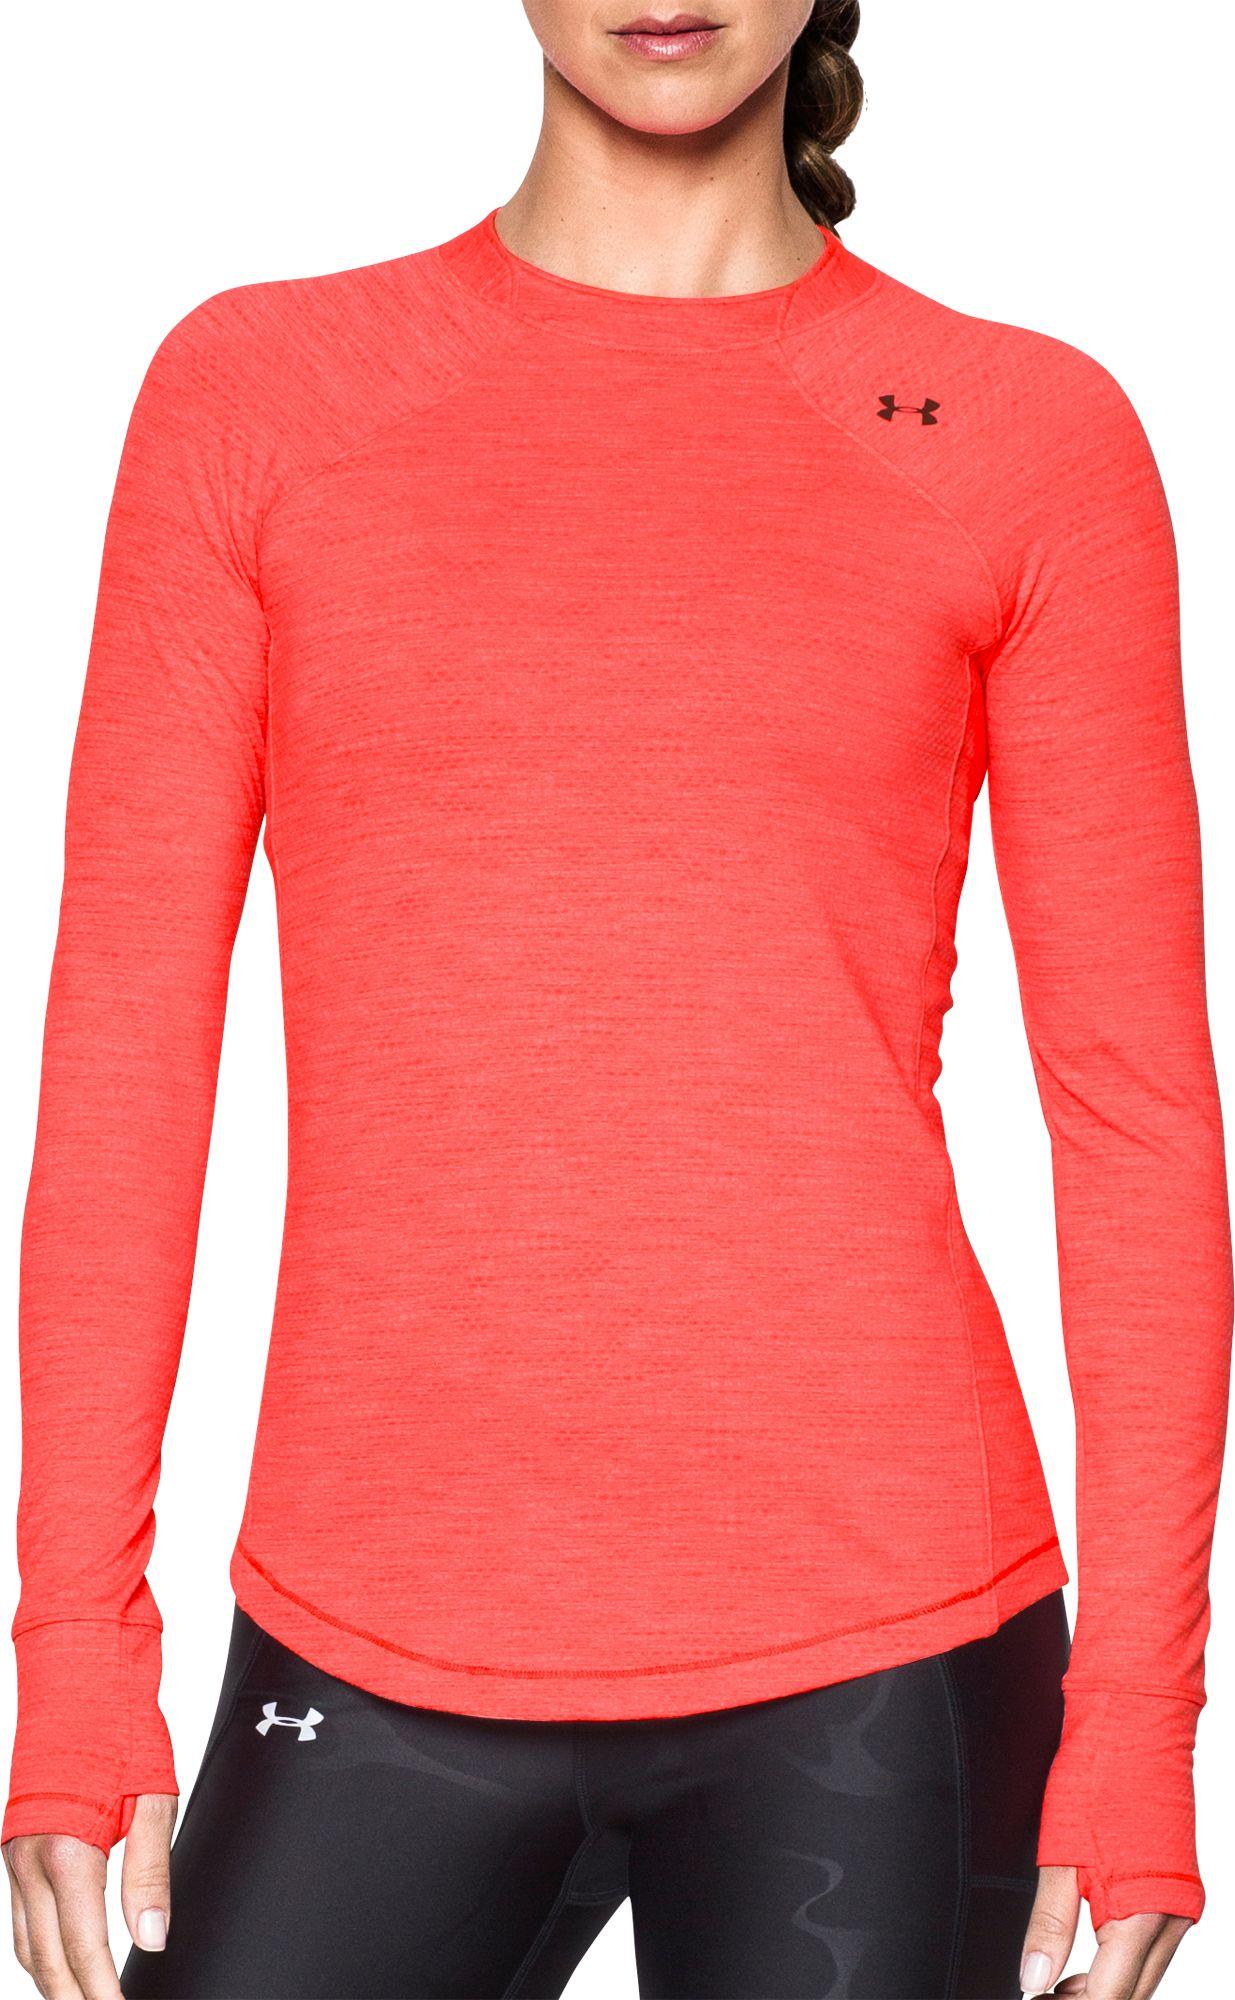 Under Armour Women's ColdGear Armour Crew Long Sleeve Shirt, Size: XS, Marathon Red thumbnail